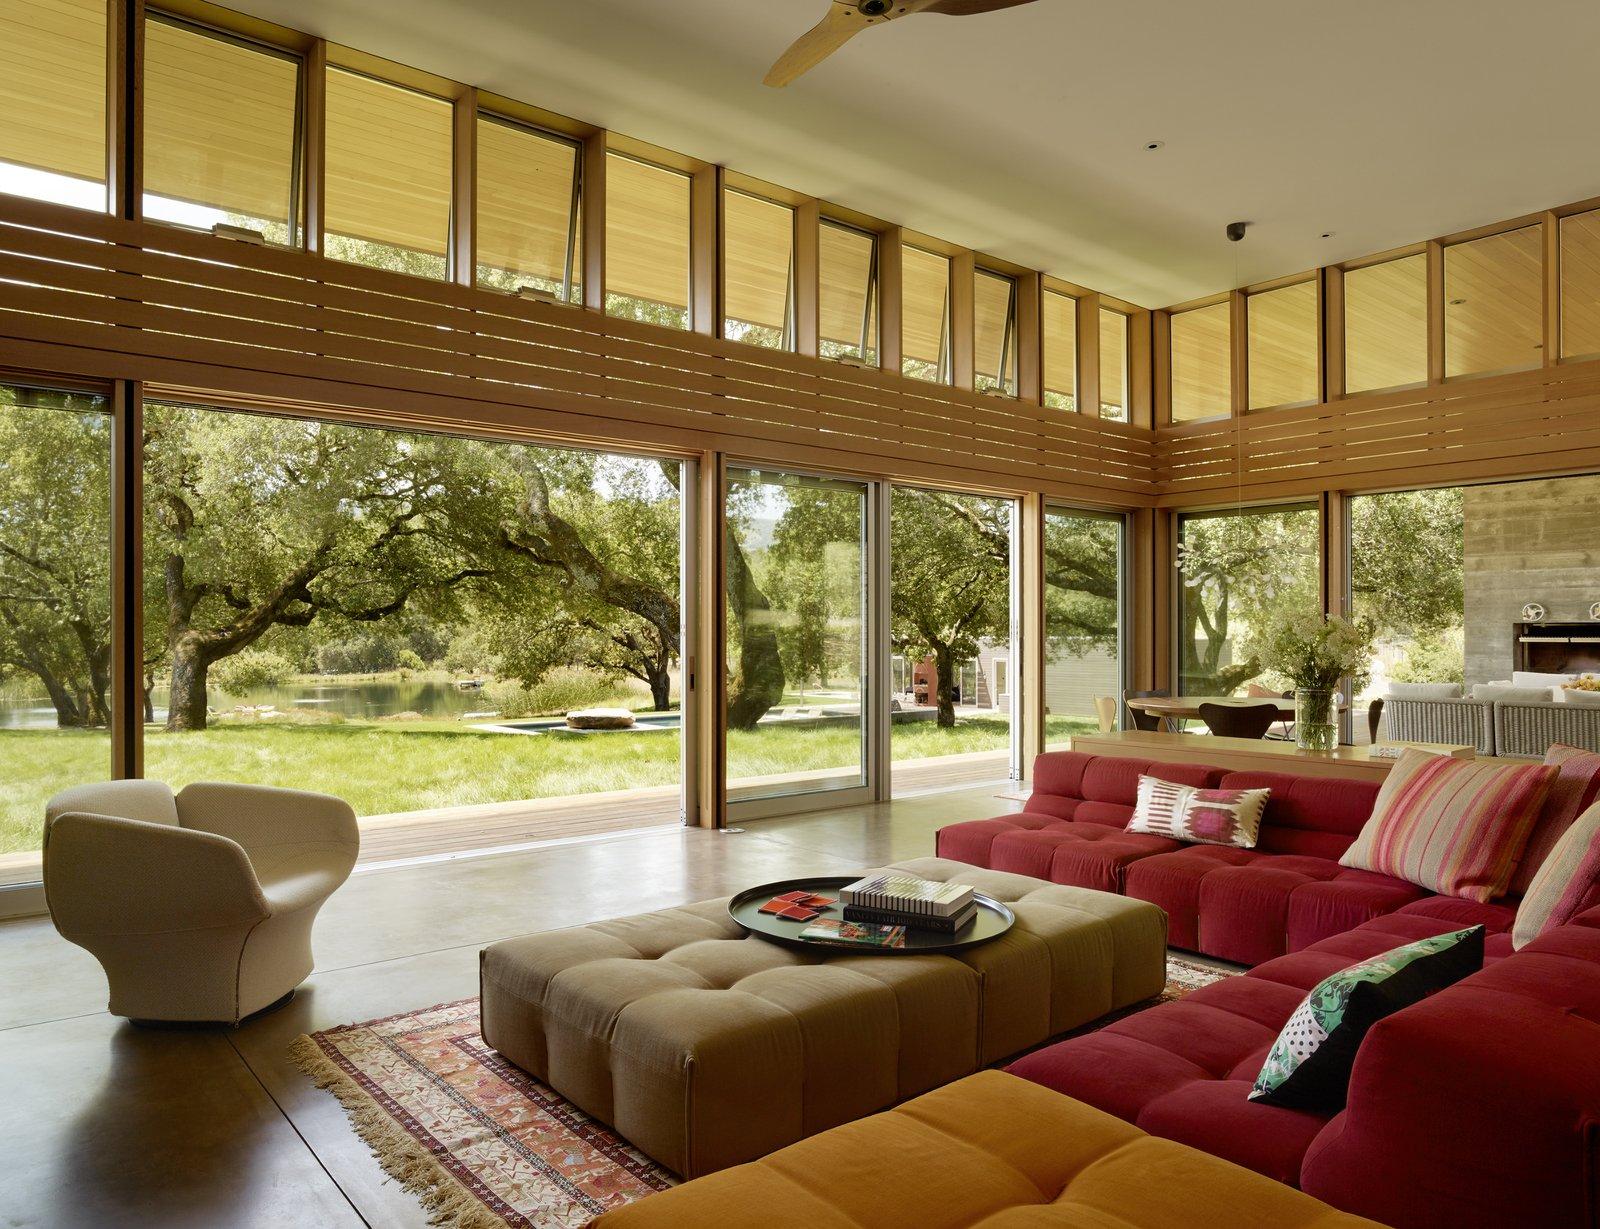 #TurnbullGriffinHaesloop #interior #livingroom #window #landscape  Sonoma Residence by Turnbull Griffin Haesloop Architects